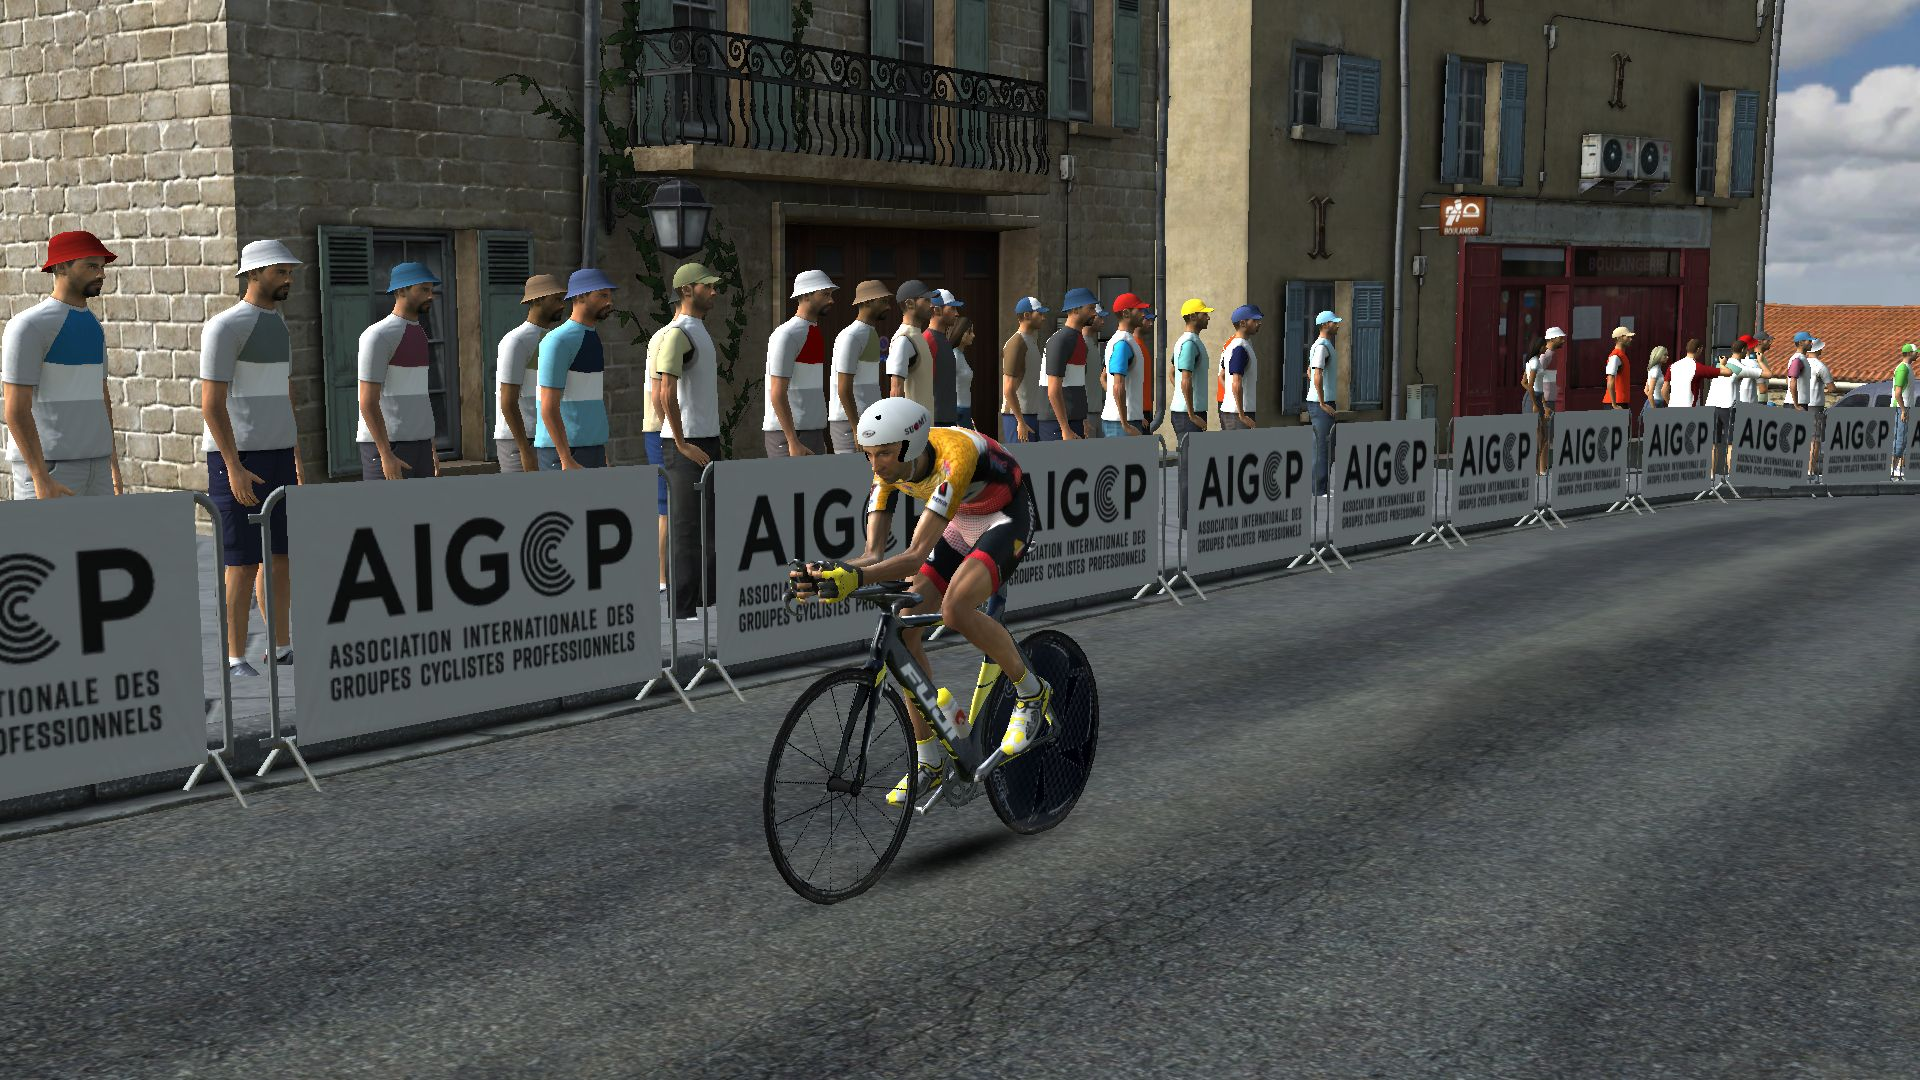 pcmdaily.com/images/mg/2019/Races/GTM/Giro/mg19_giro_09_PCM0023.jpg